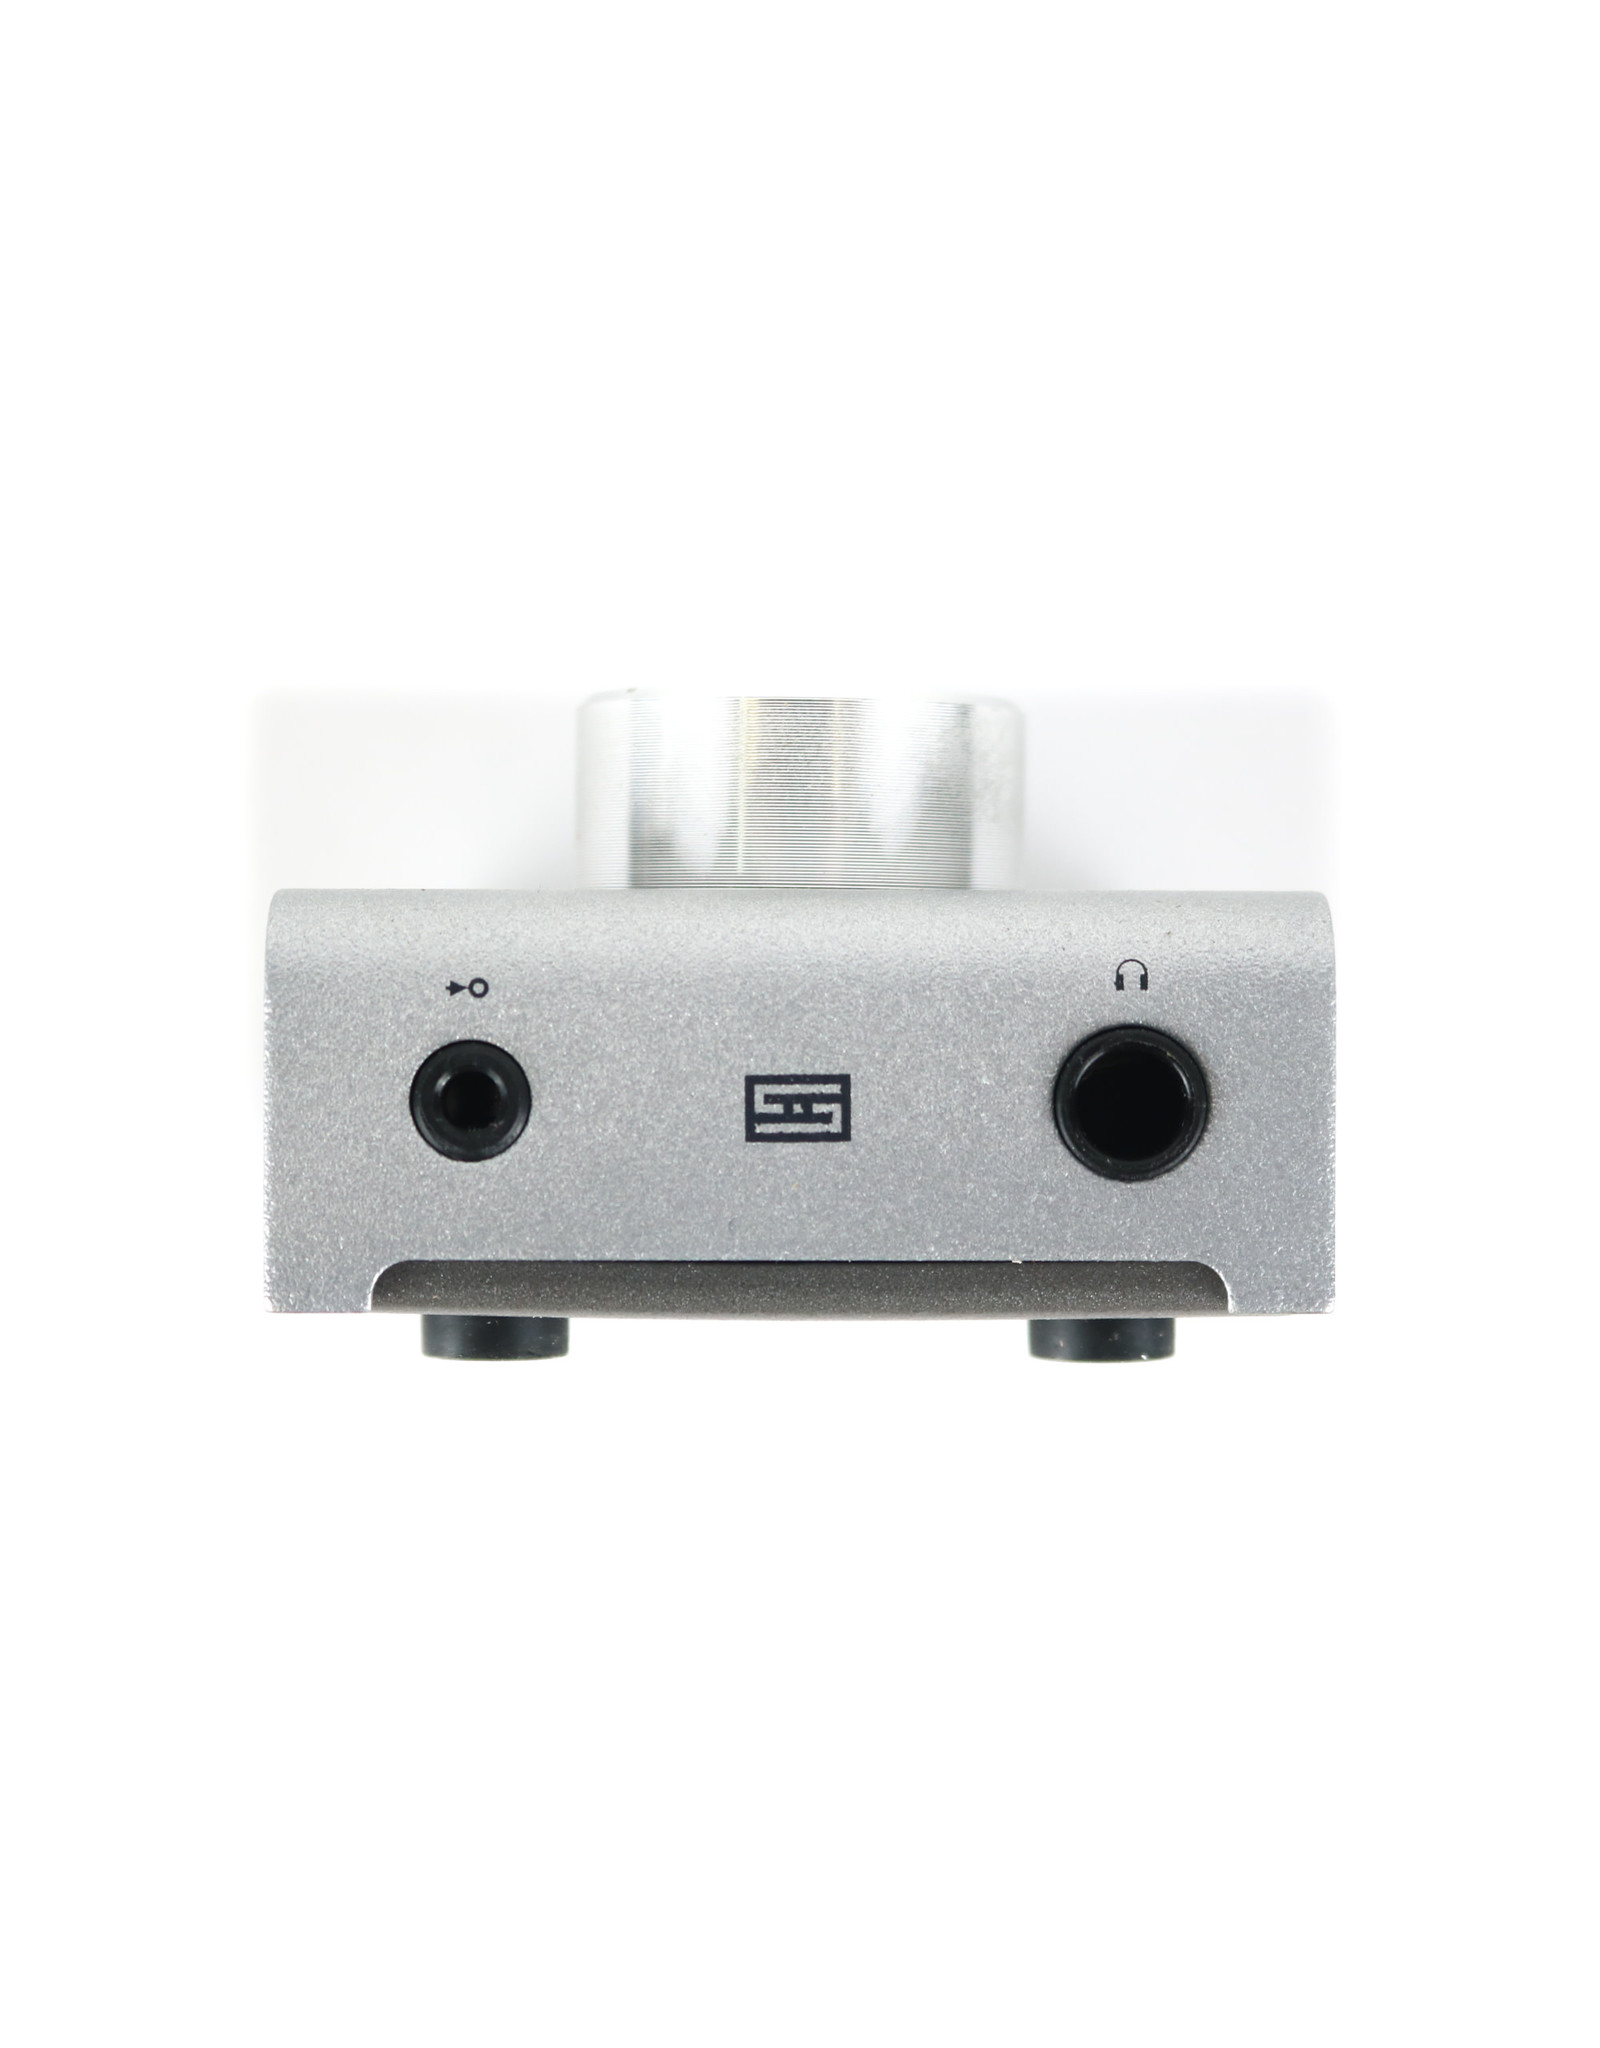 Schiit Schiit Fulla 2 Headphone Amp / DAC USED